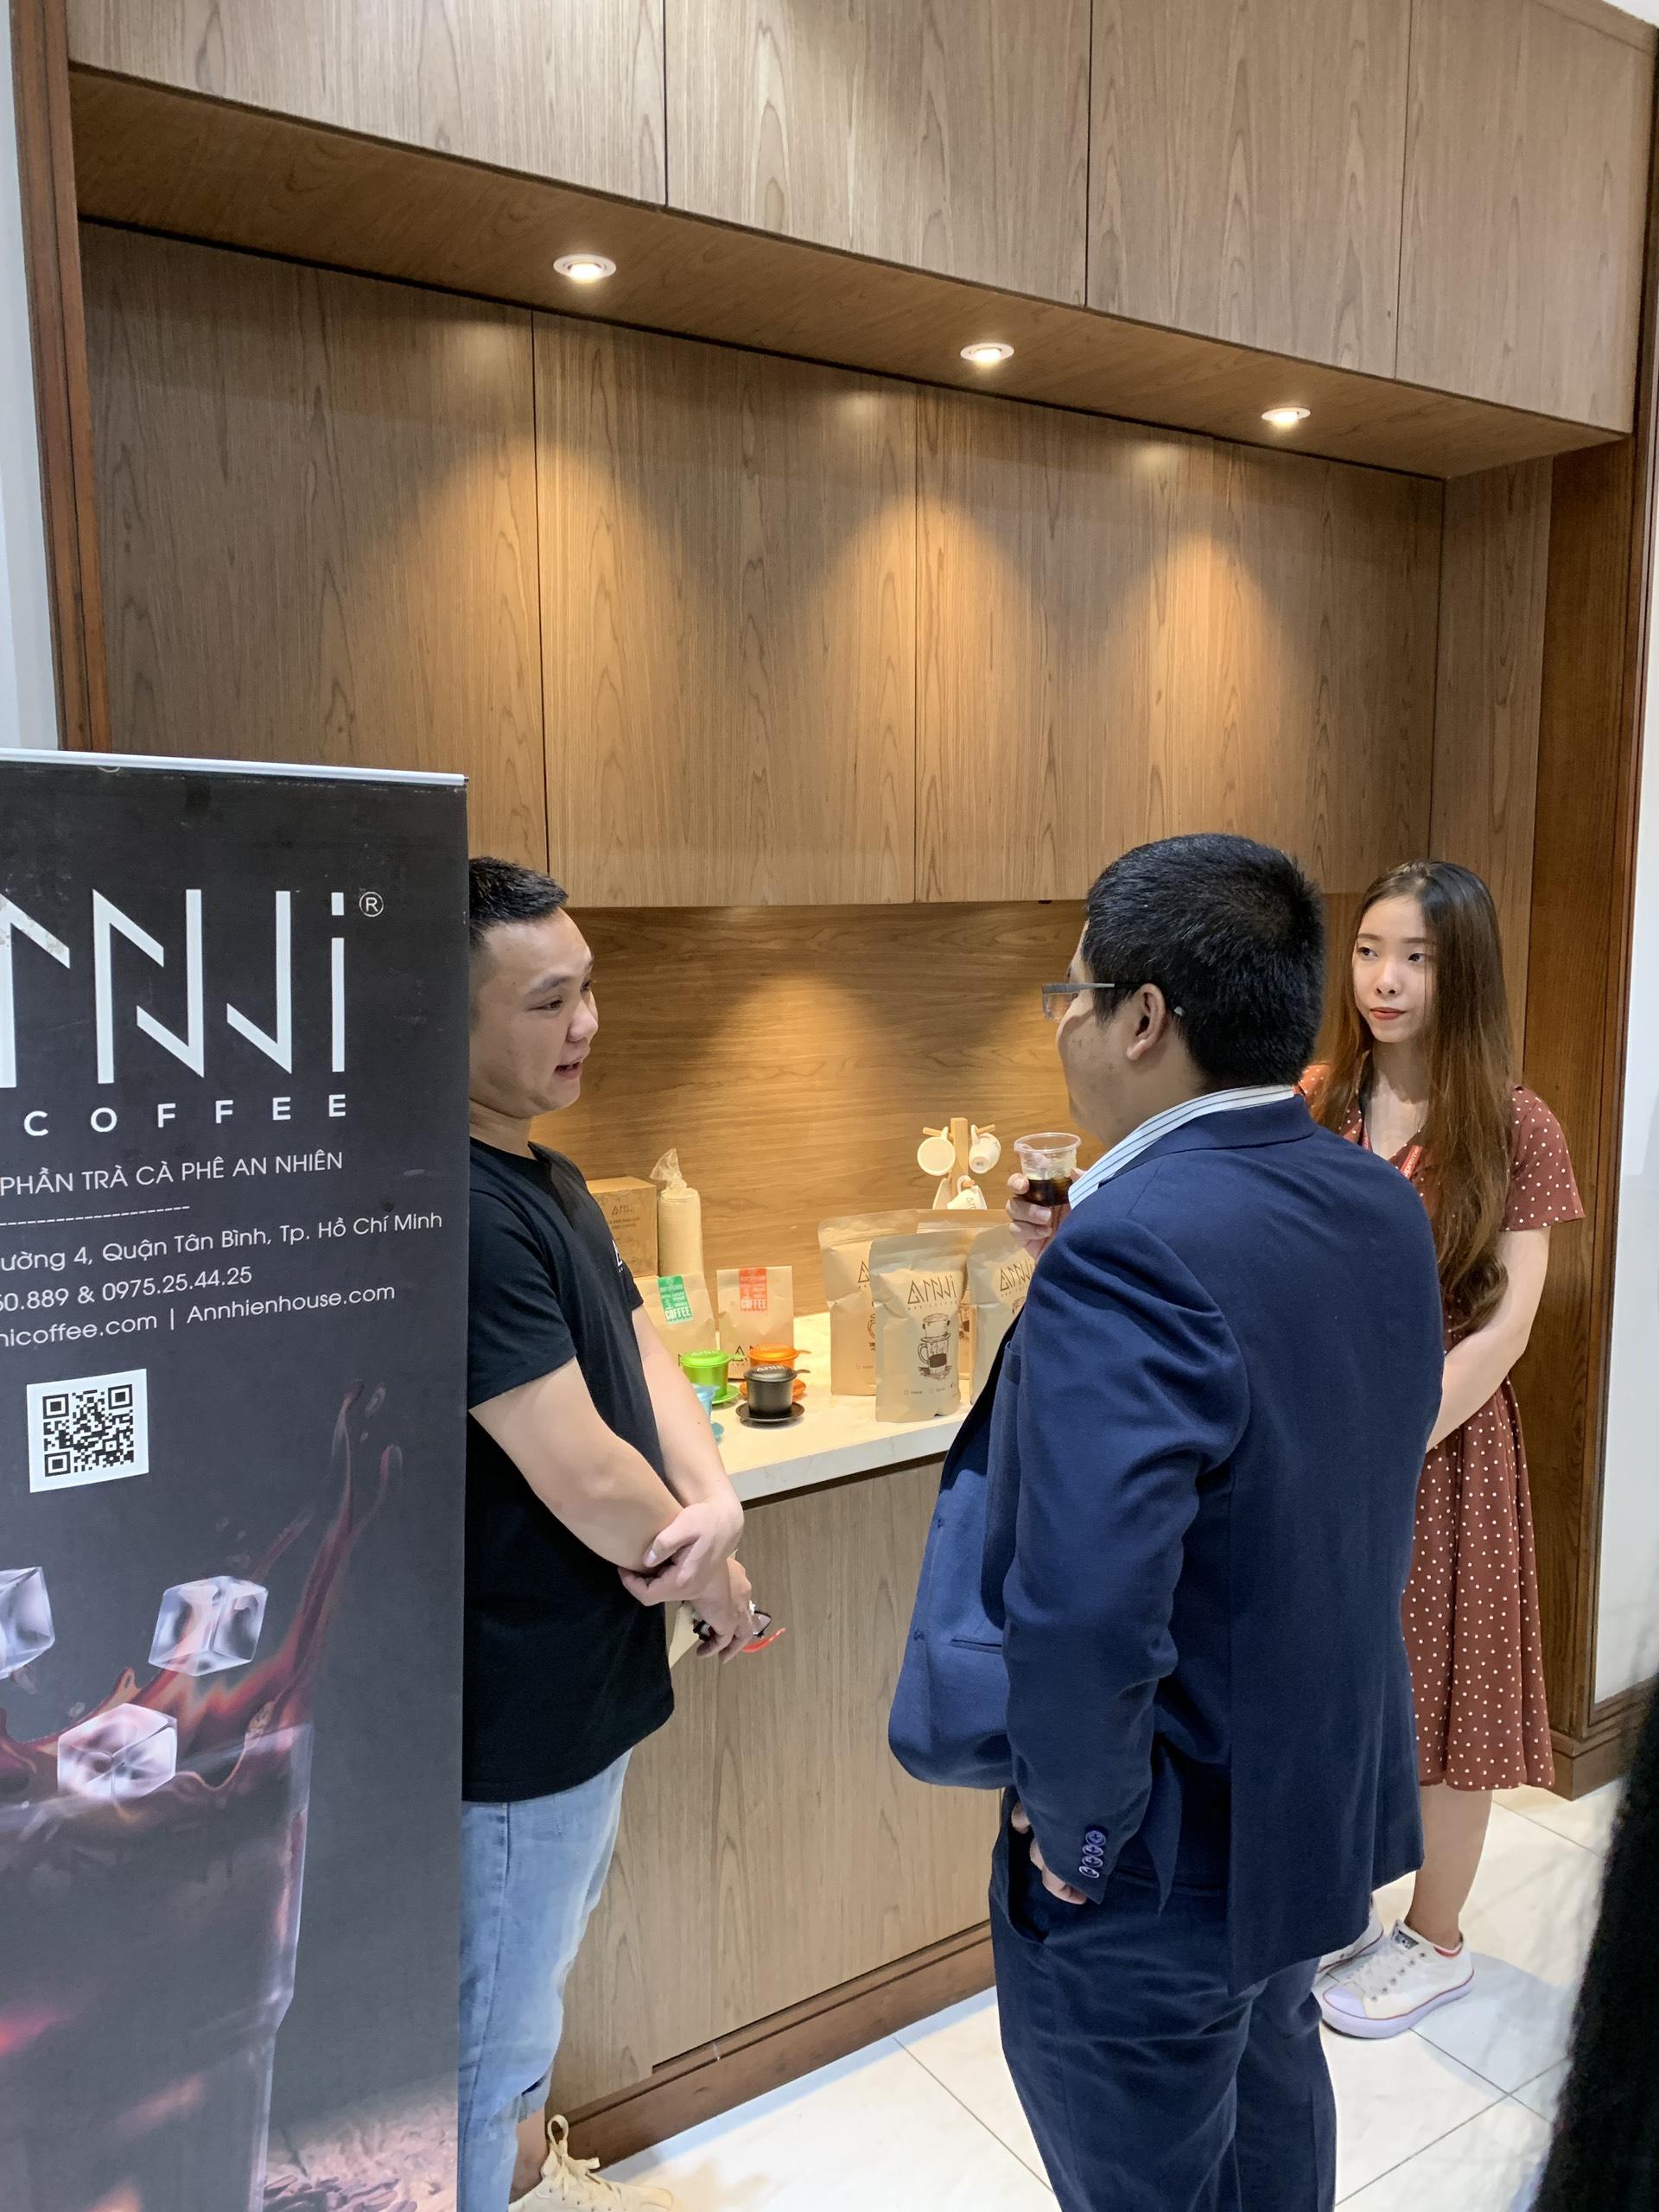 Anni Coffee giới thiệu sản phẩm tại buổi hội thảo